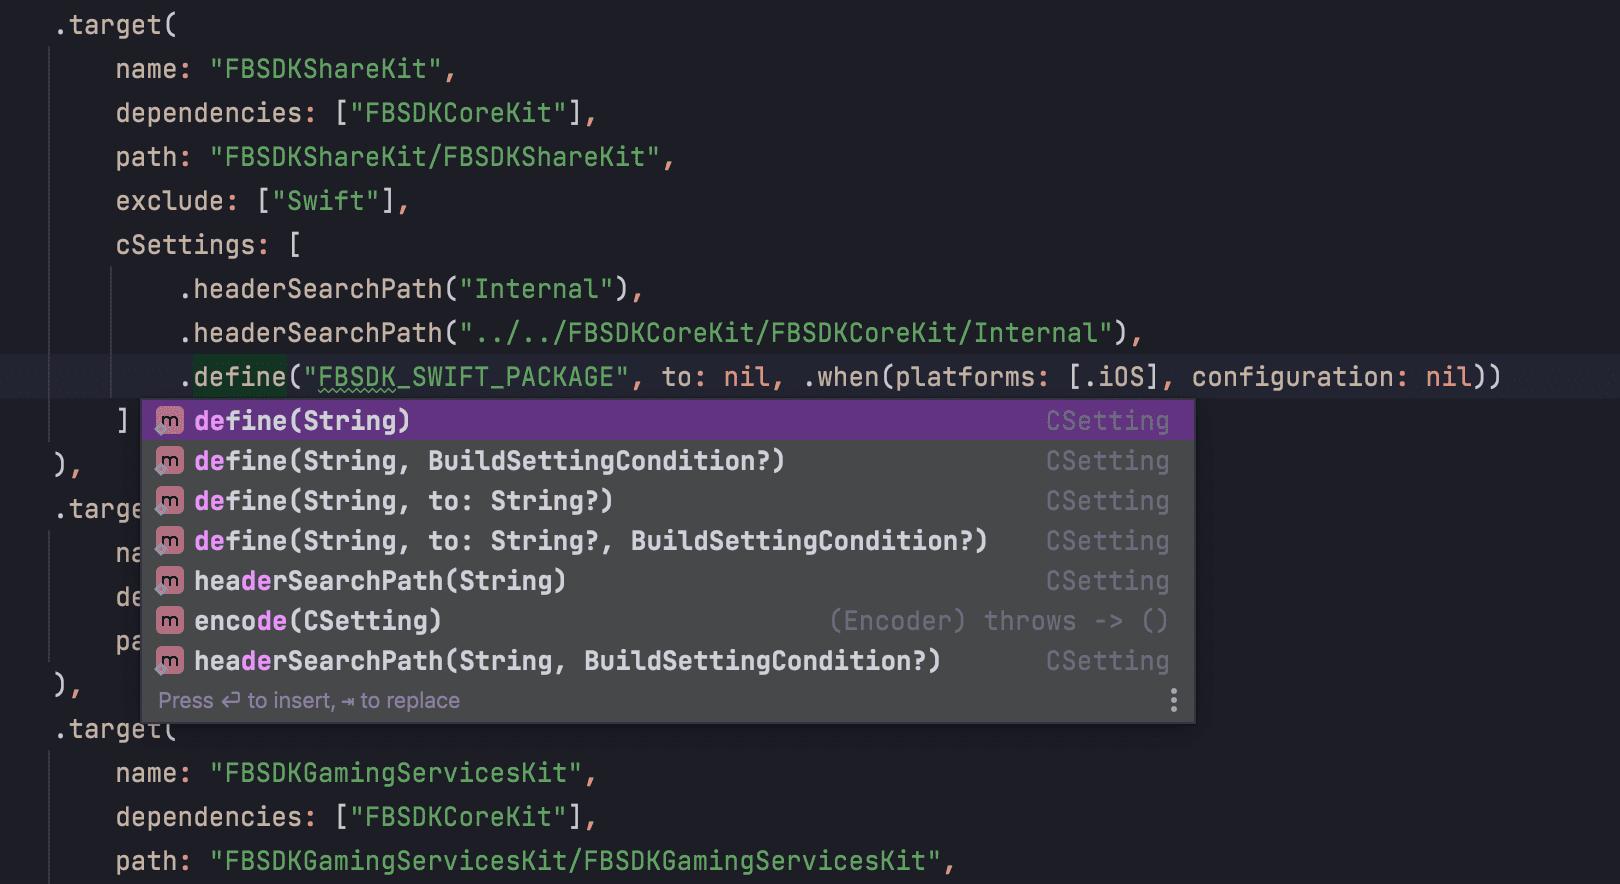 SPM build settings